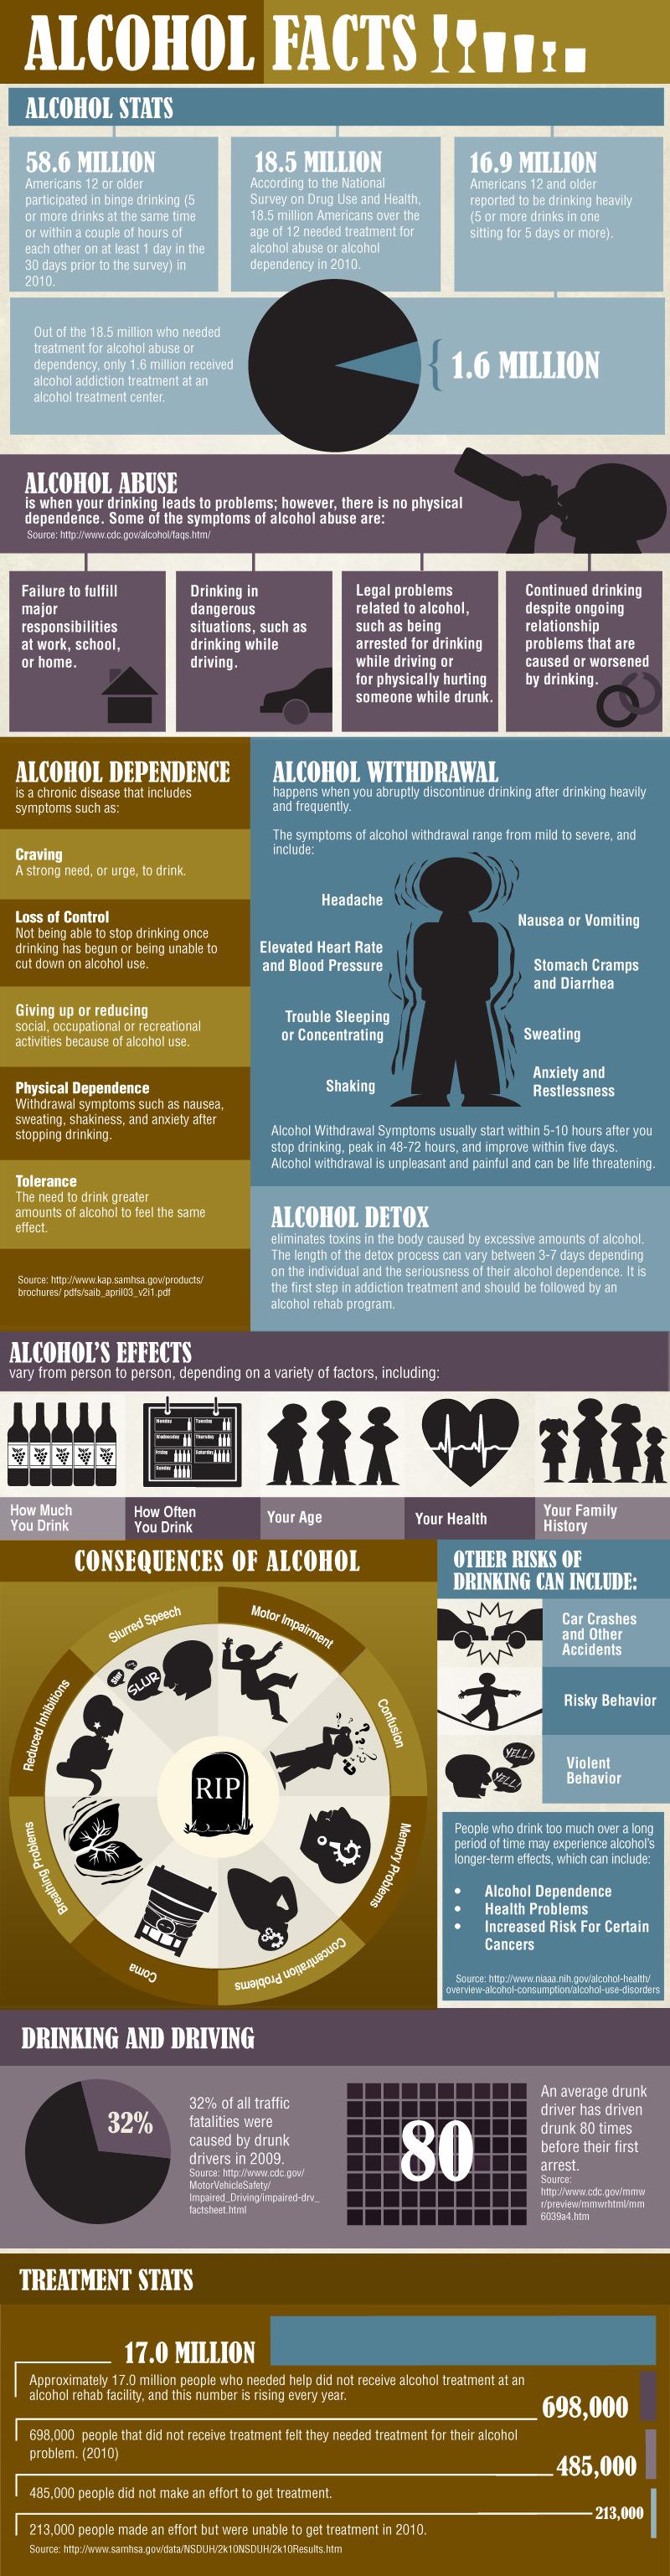 Alcohol Addiction Information